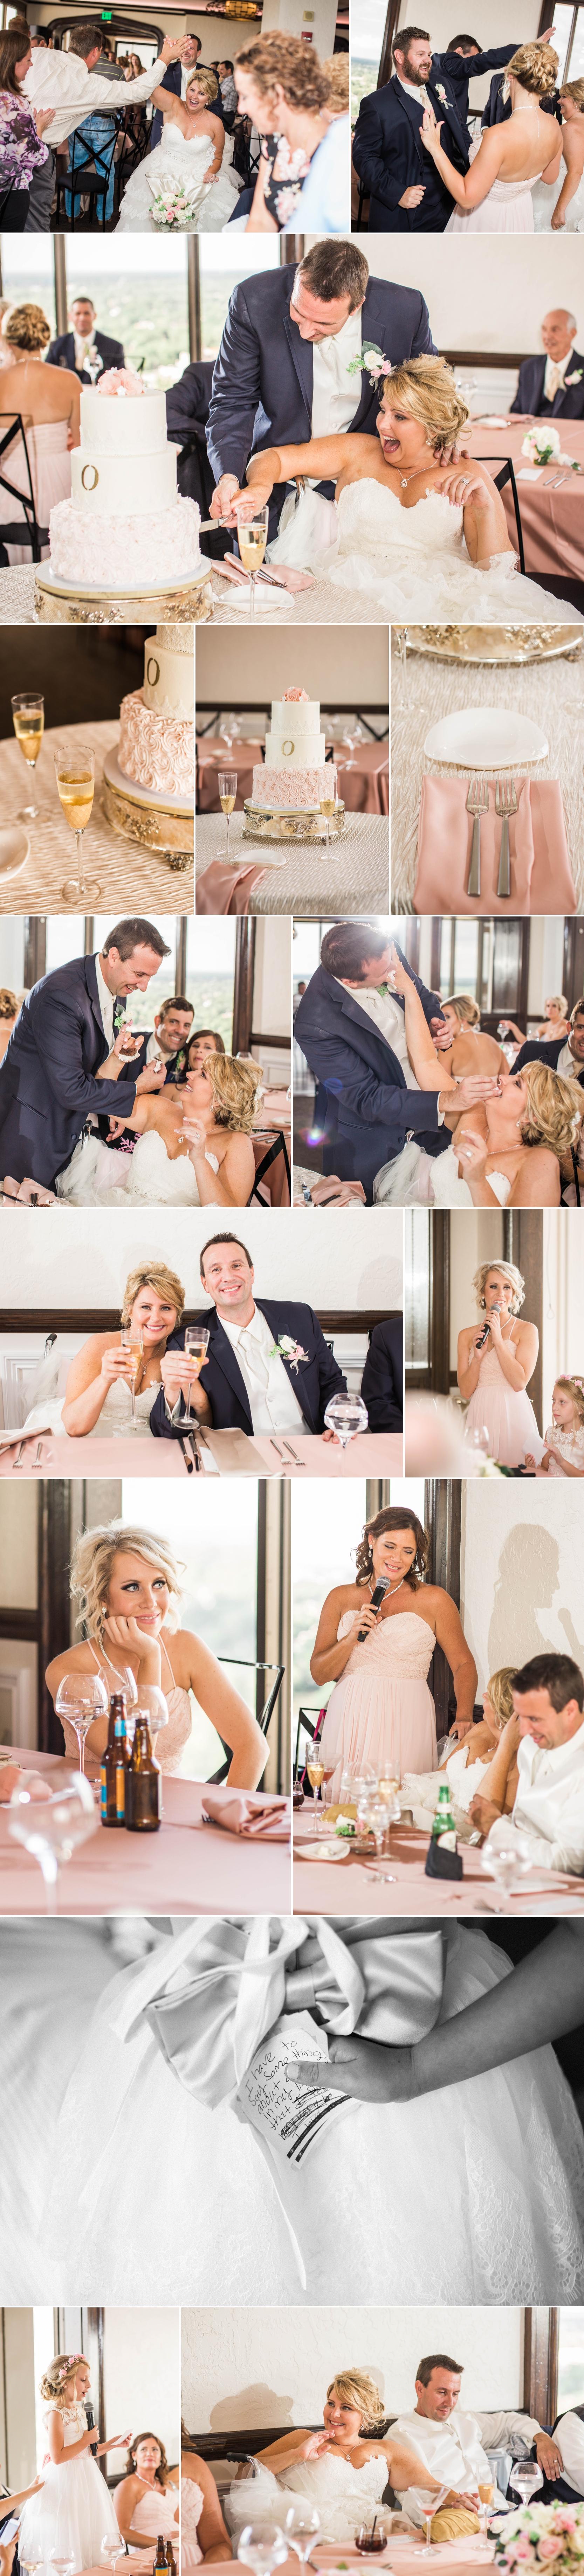 wedding-wedding day-downtown fort wayne-bride-groom-love-wedding party-reception-empyrean-wedding cake-toasts